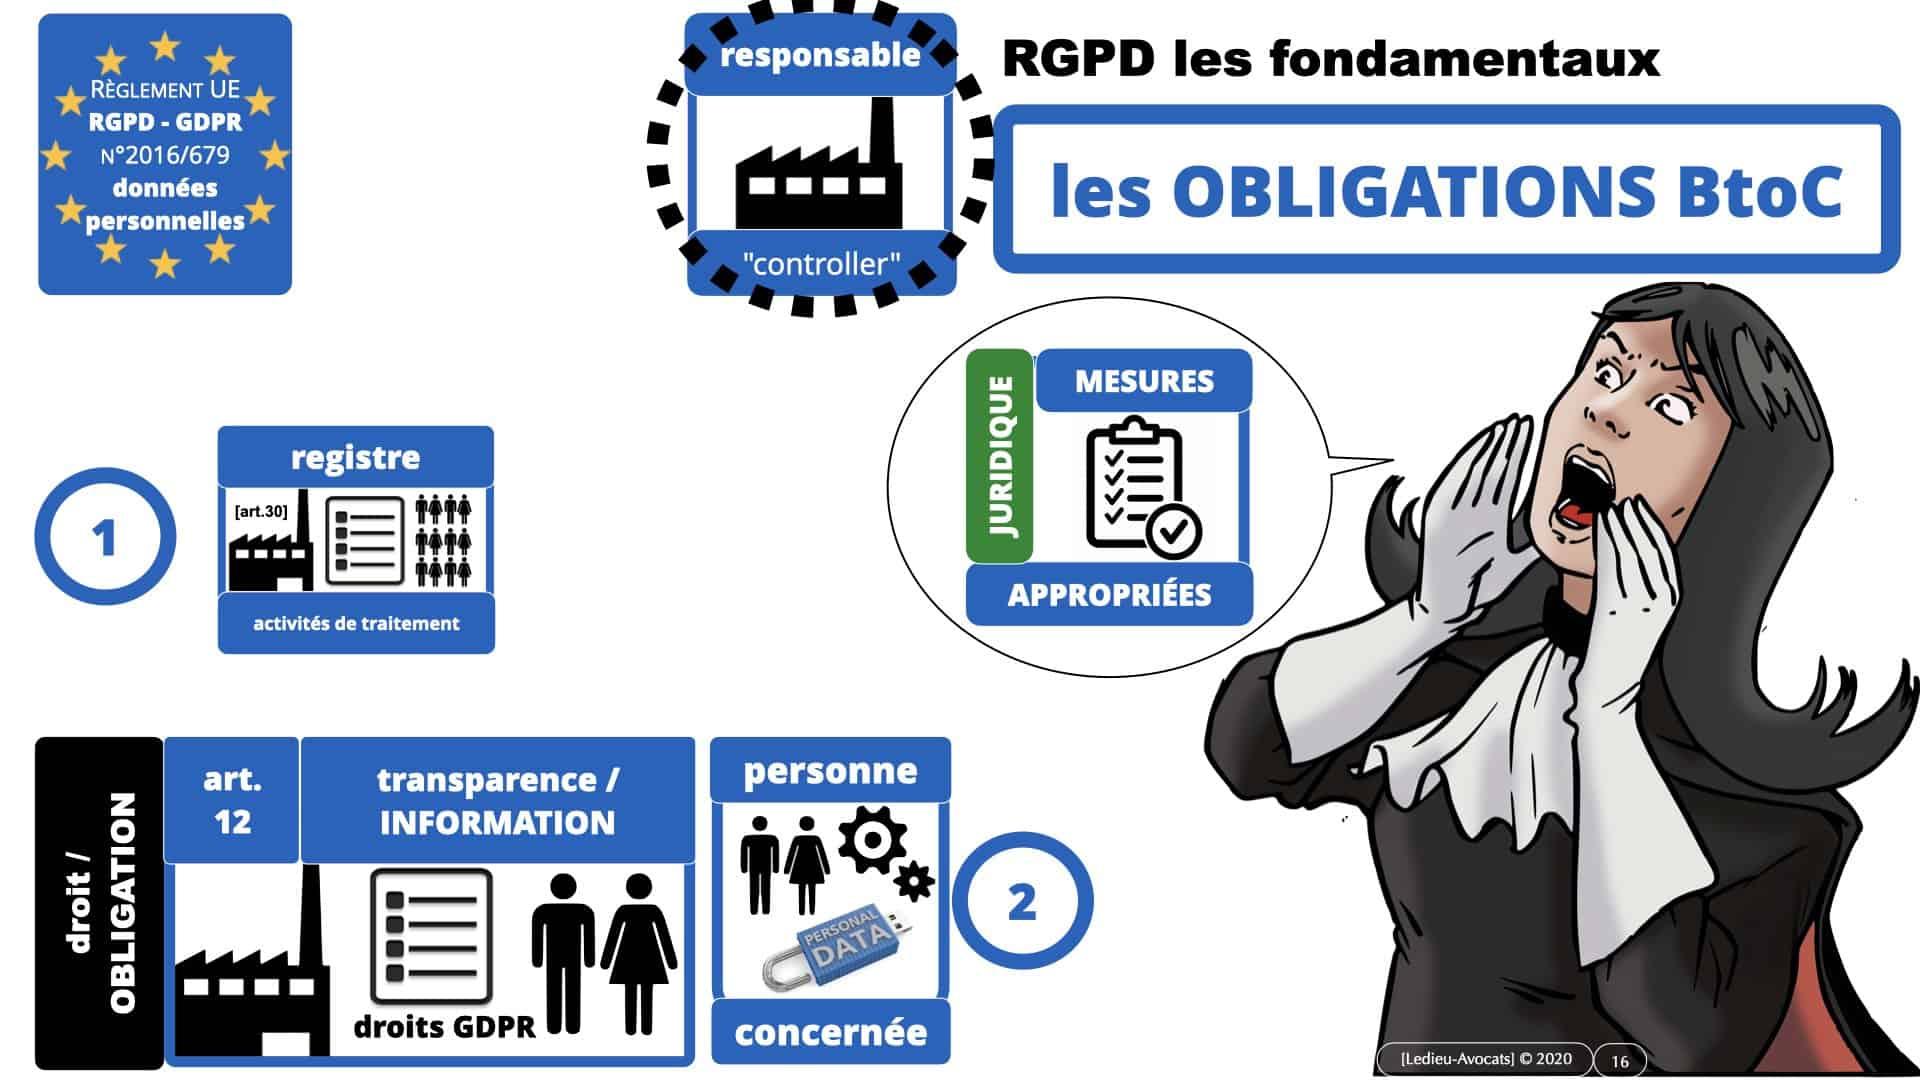 312 AWS PODCAST RGPD [20-11-2020] *16:9* © Ledieu-Avocats 20-11-2020.016